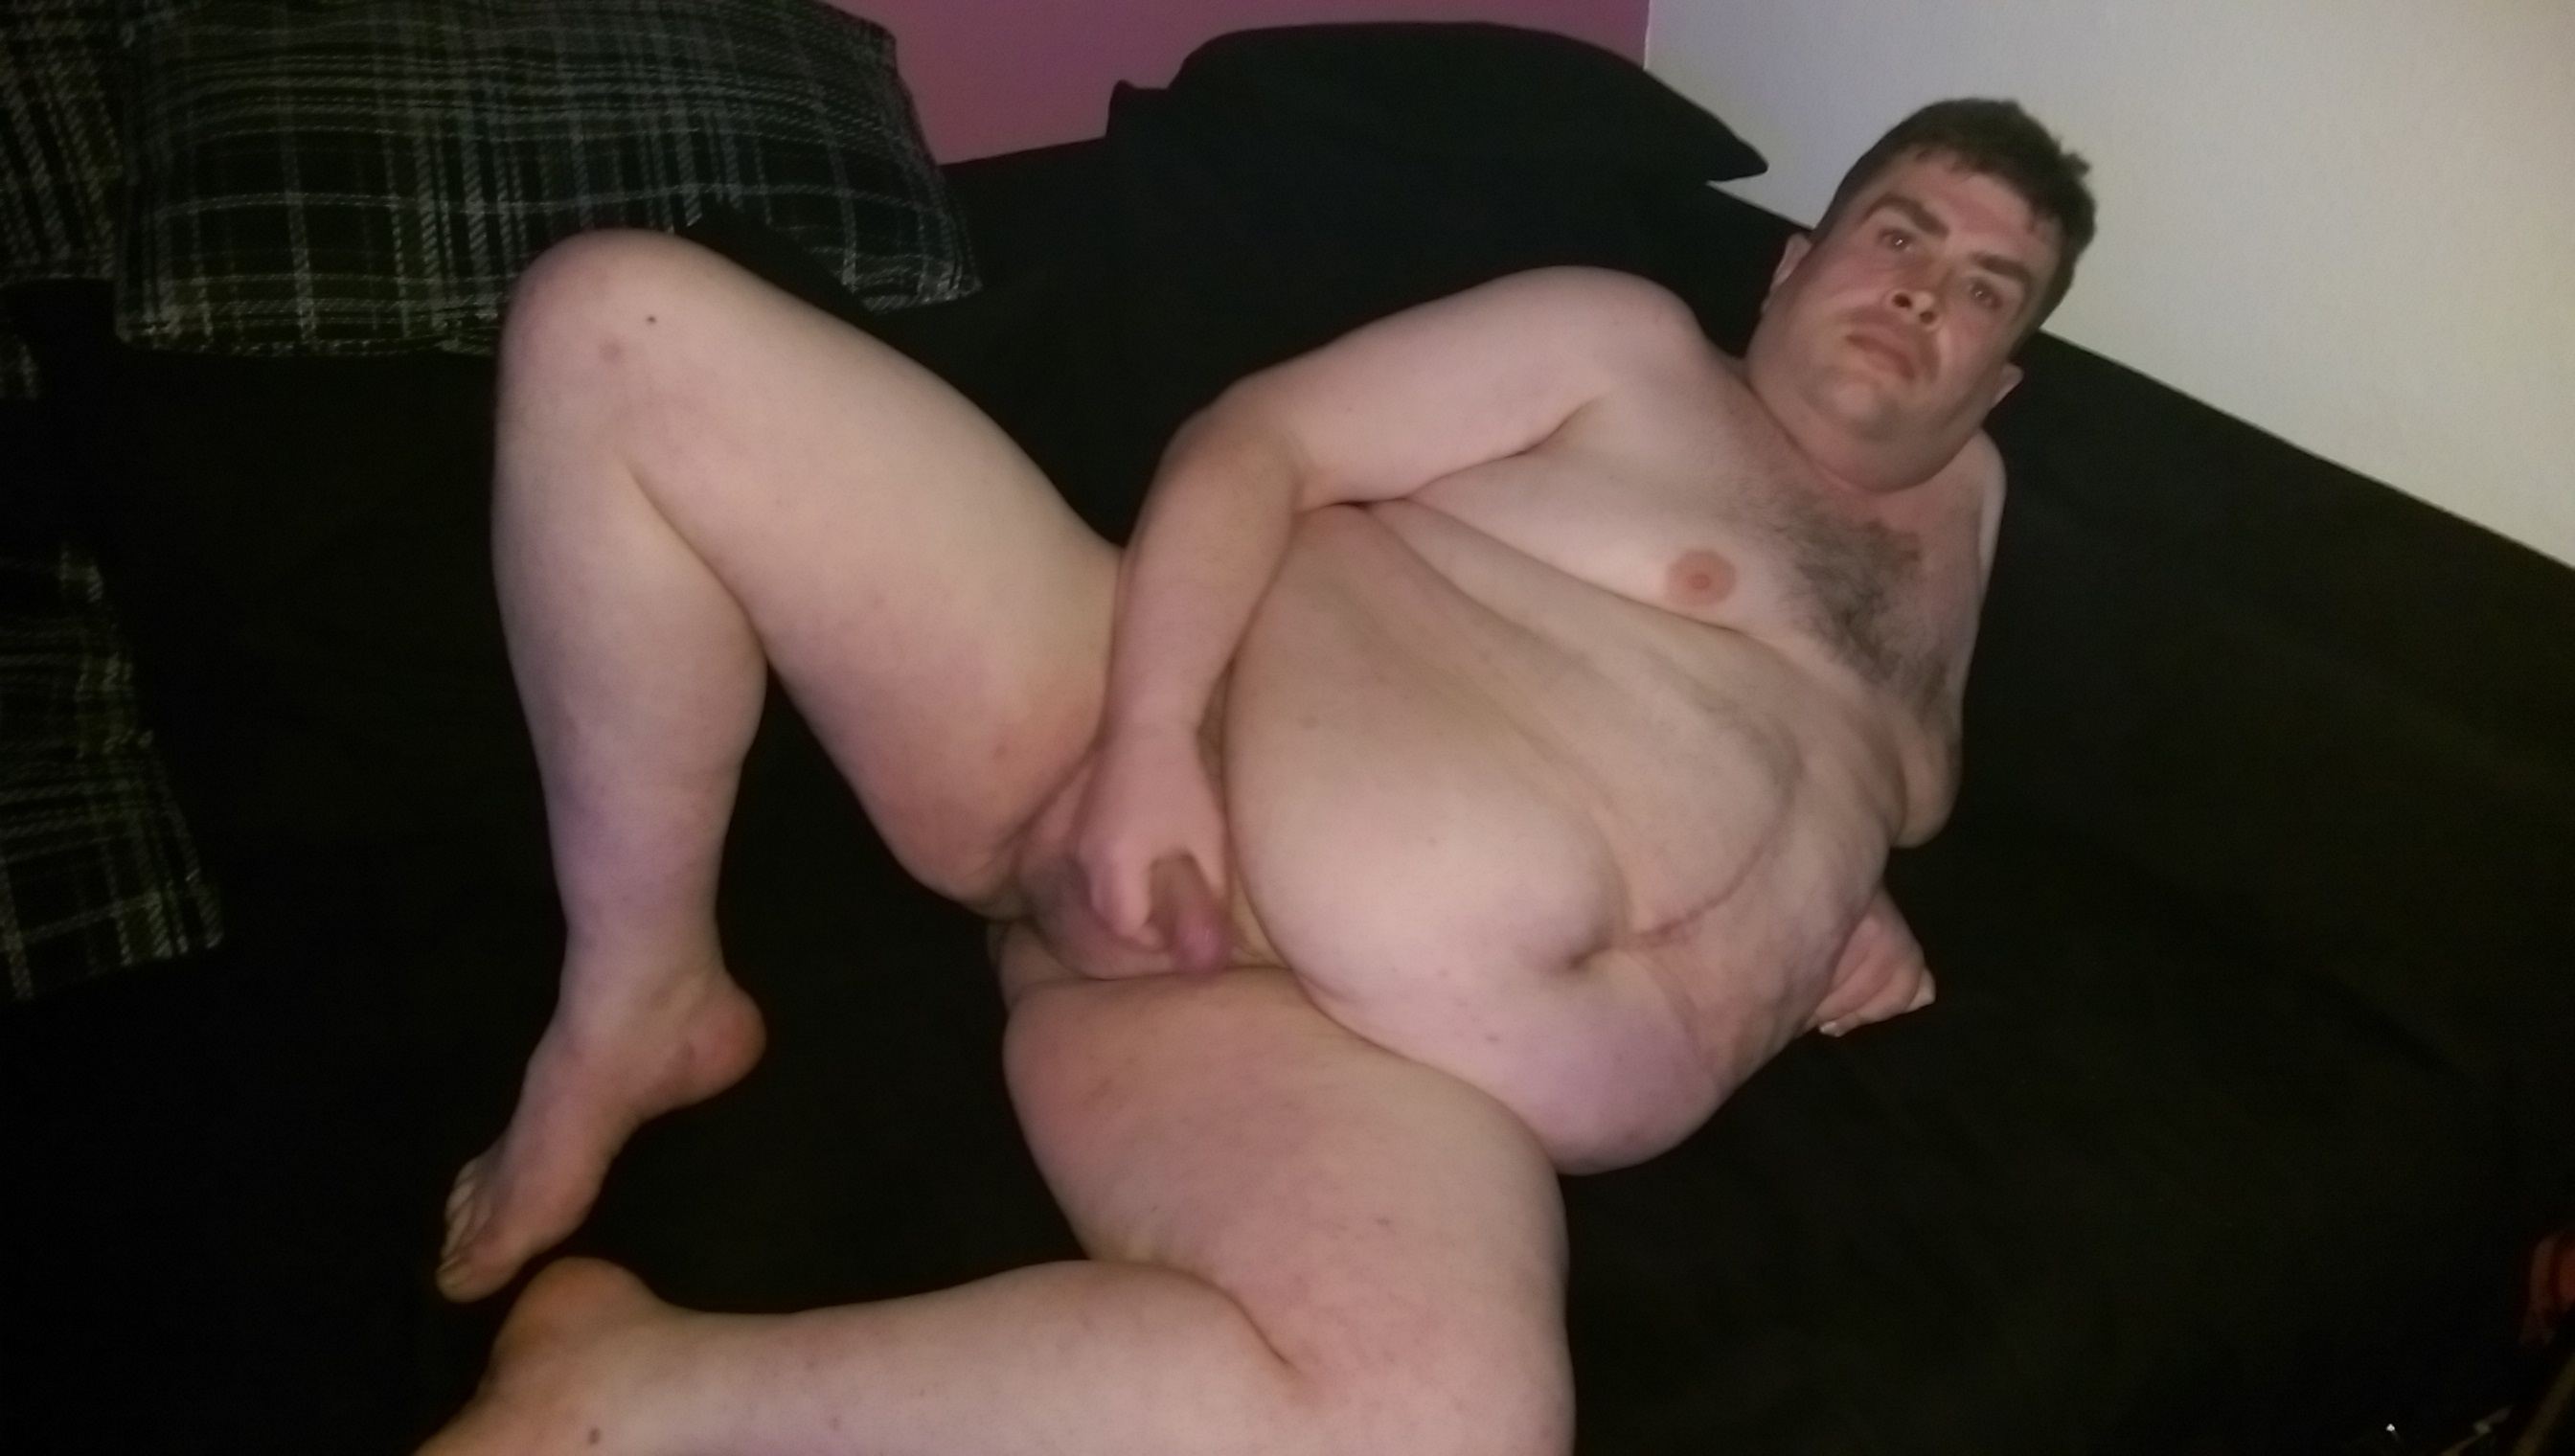 Amateur Chubby Male Porn adult chubby free picture porn xxx - xxxpicss